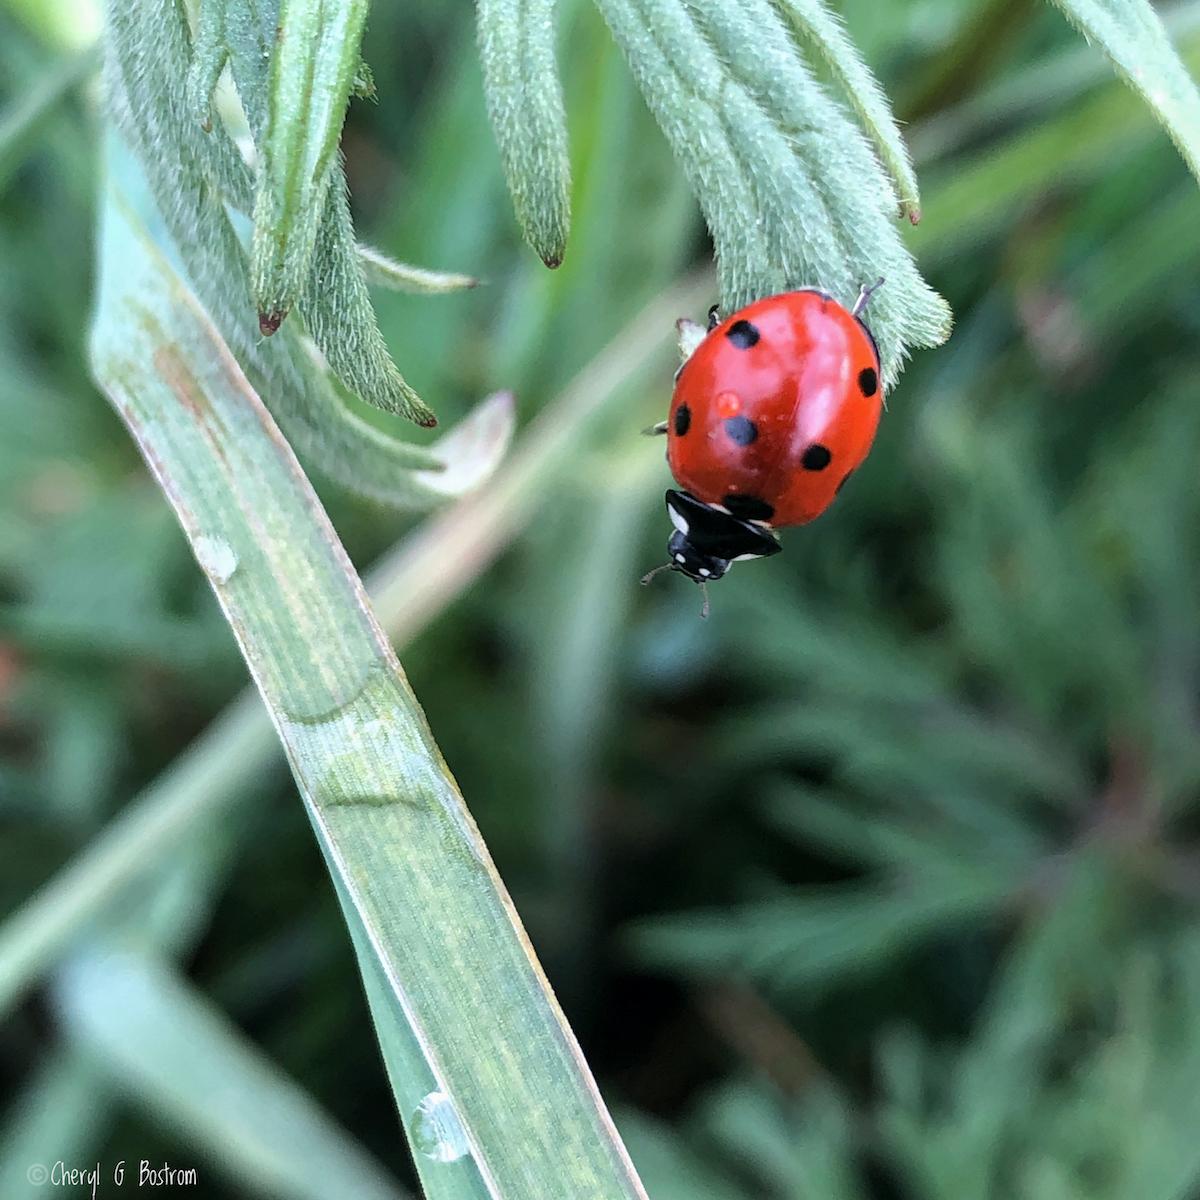 Reacher-Native-ladybug-reaches-into-air